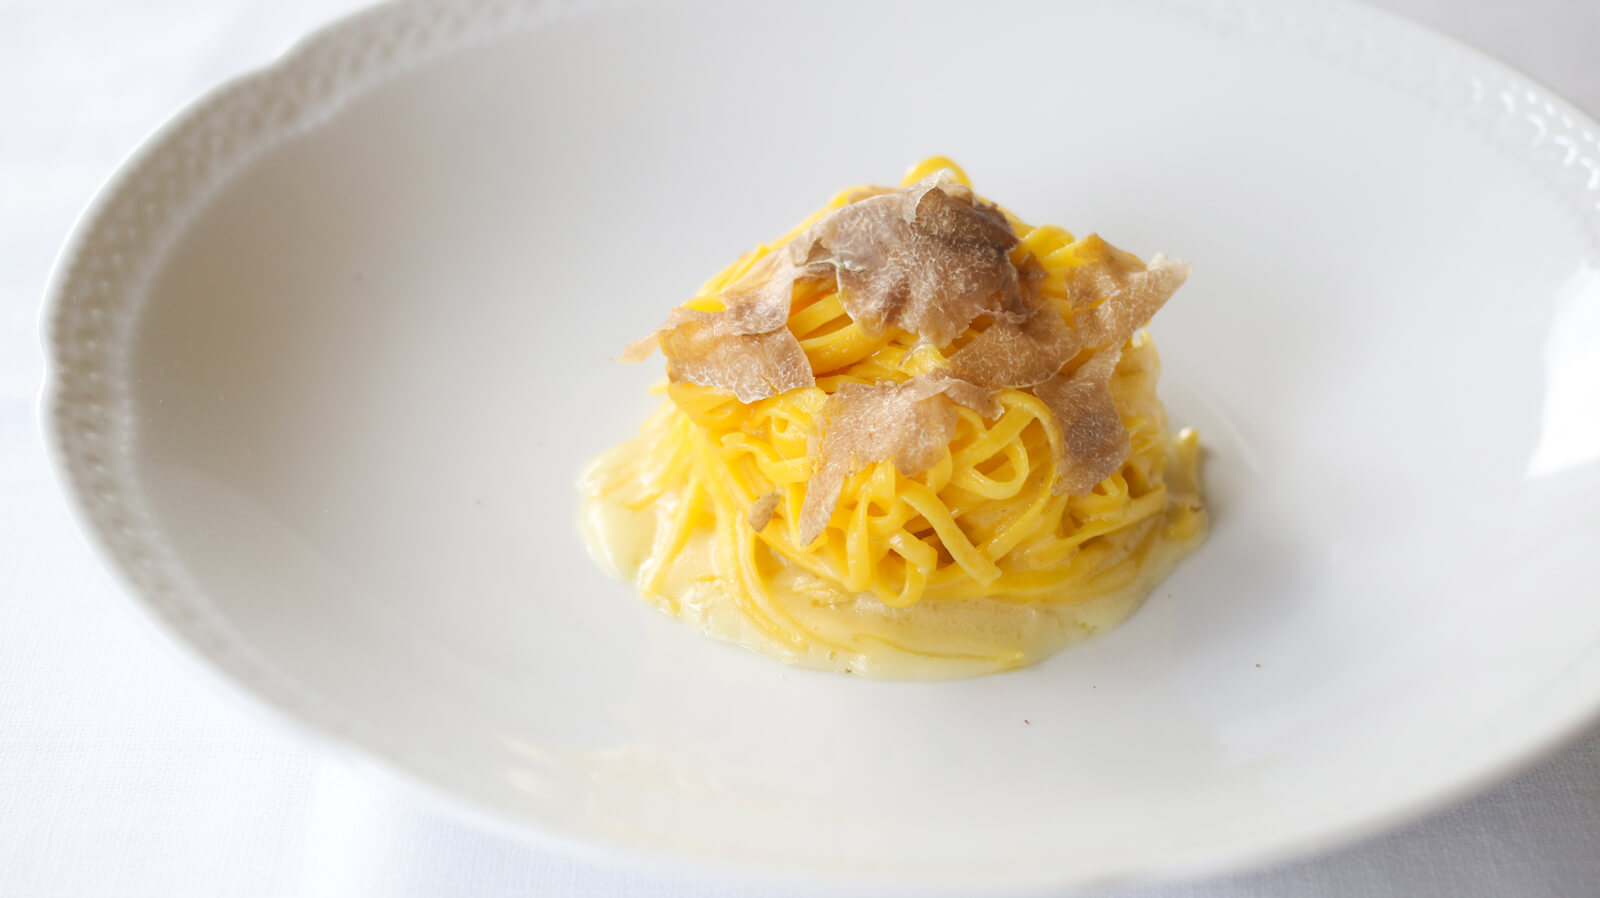 papaveri_e_papere_ristorante_san_miniato_16ee-6